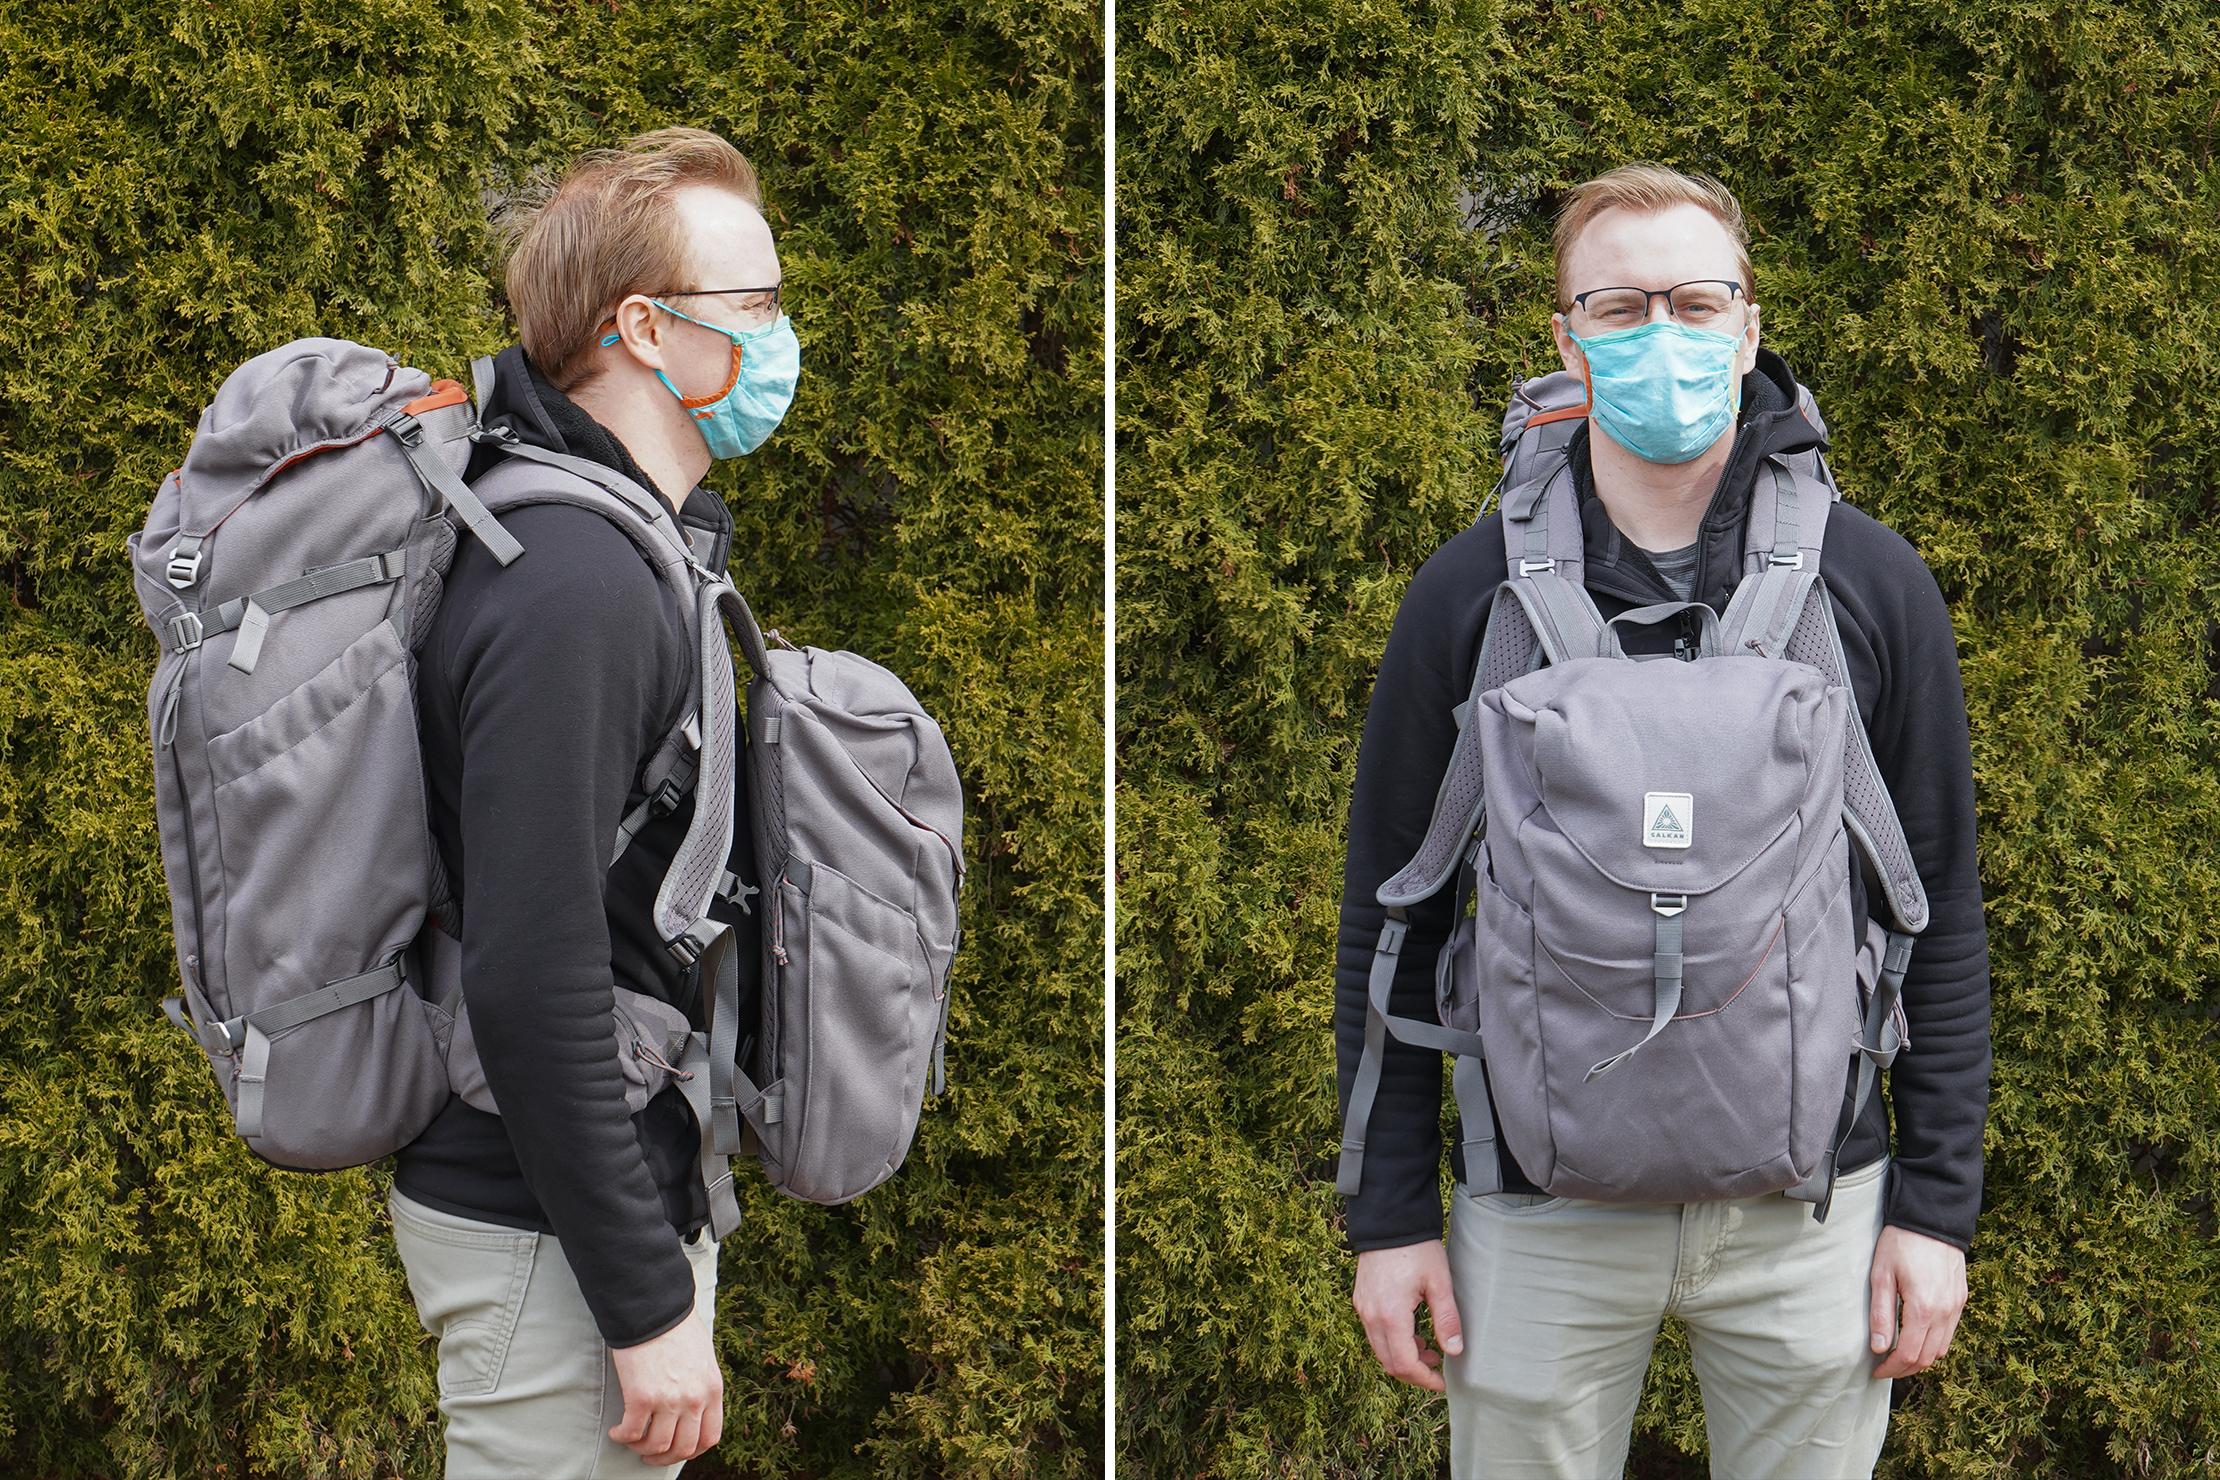 Salkan Backpacker | Carrying both backpacks